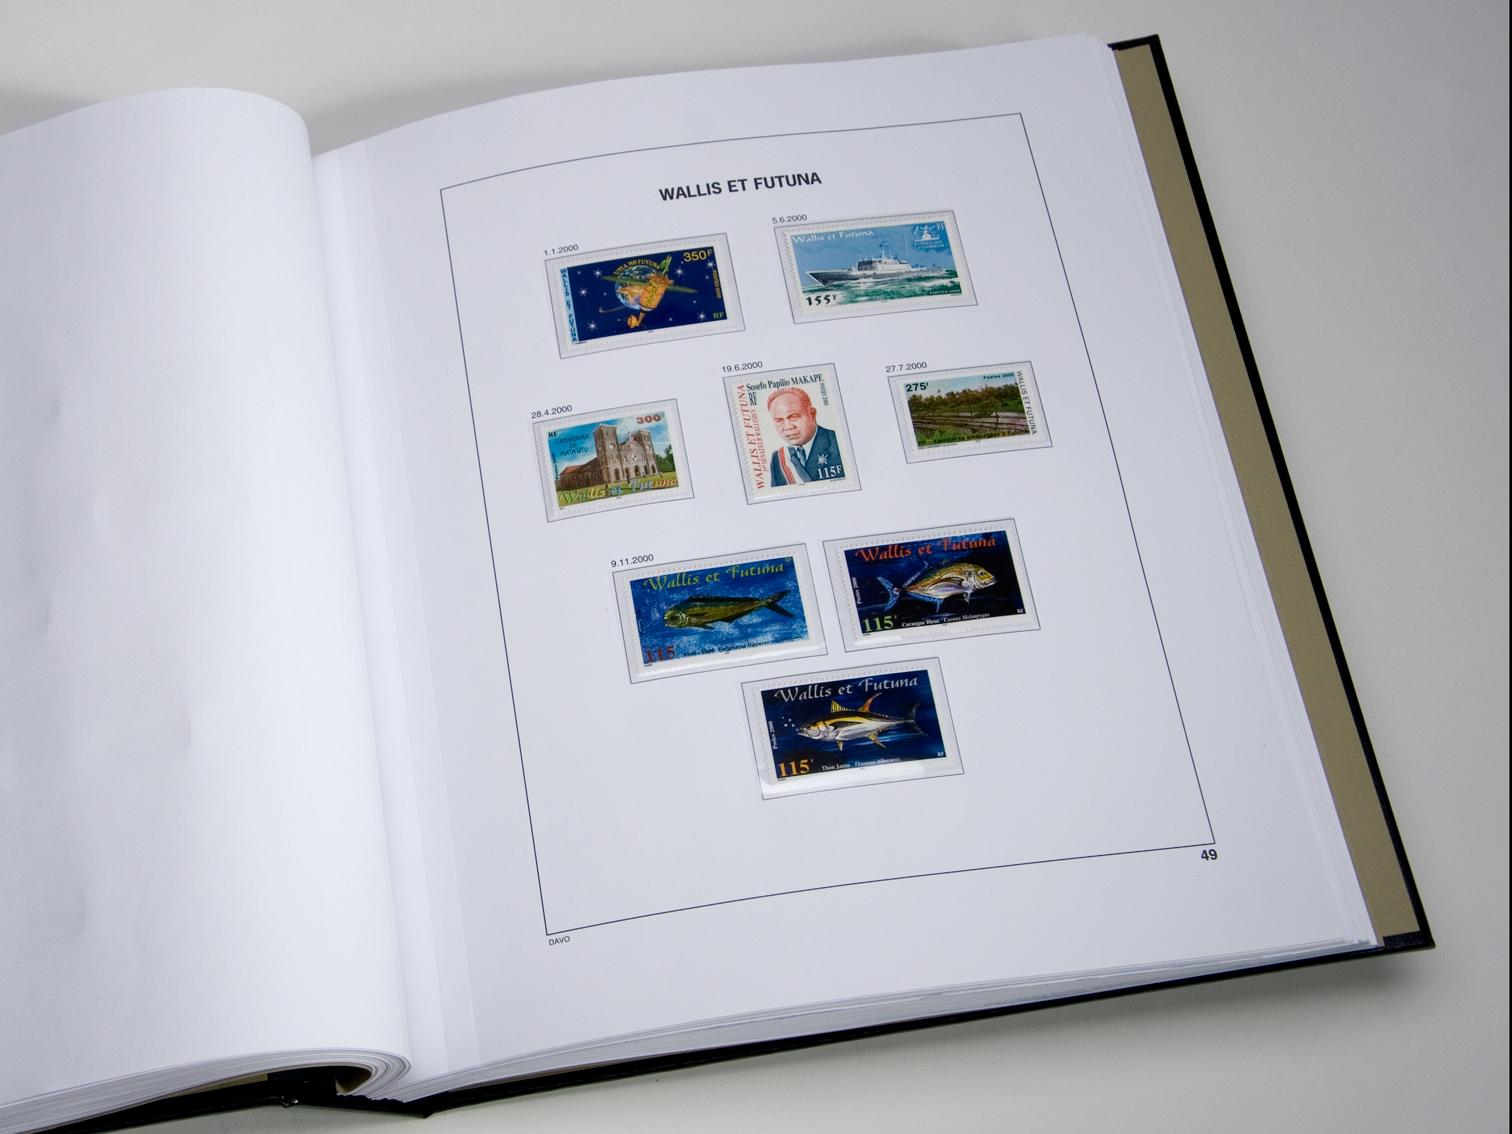 Wallis & Futuna Luxe Album Volume 2 2000-2019